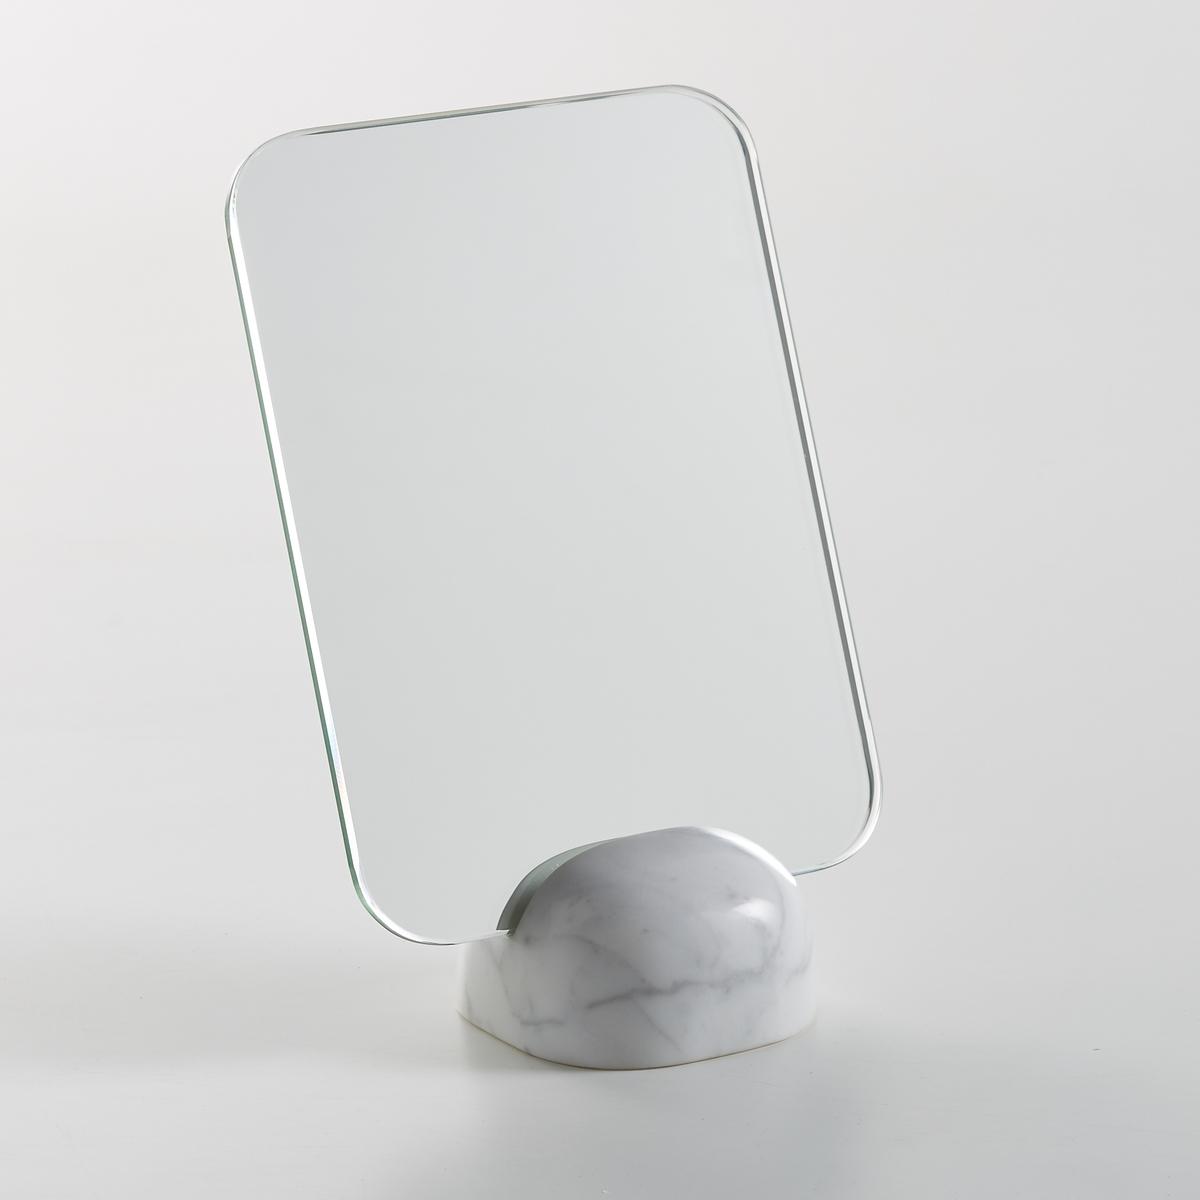 Зеркало на мраморном основании, В.20 см, Barbieri<br><br>Цвет: белый мрамор